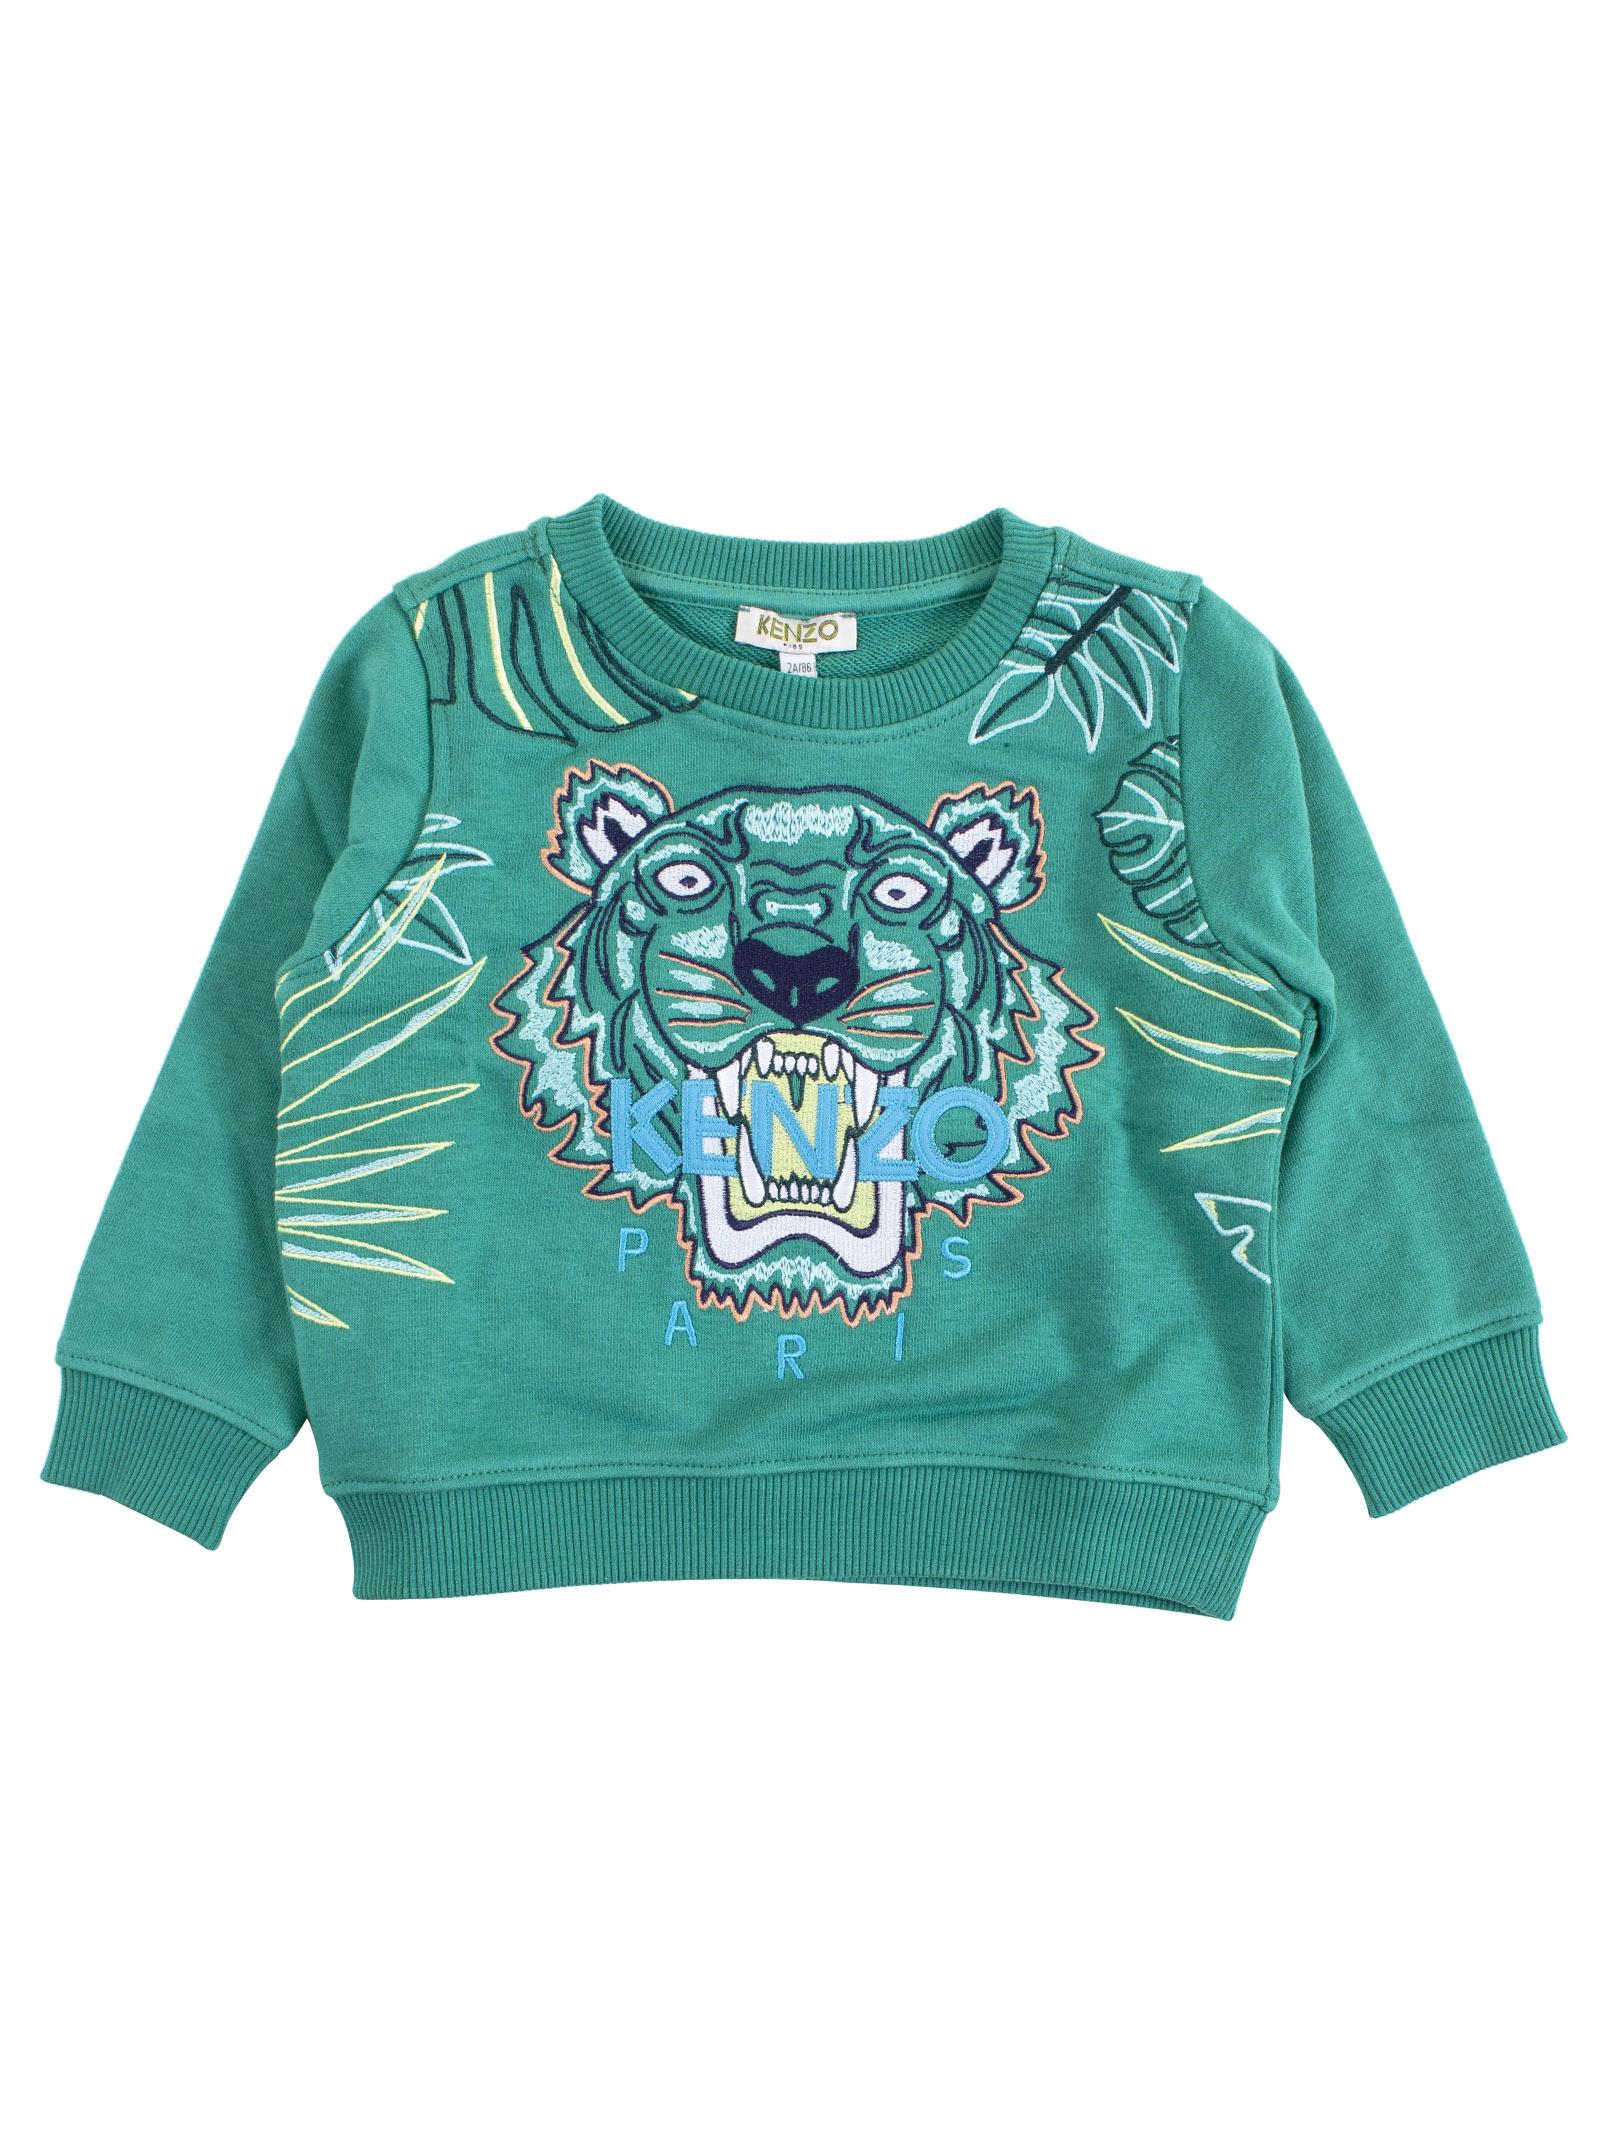 81c98357 Kids sweatshirt with print